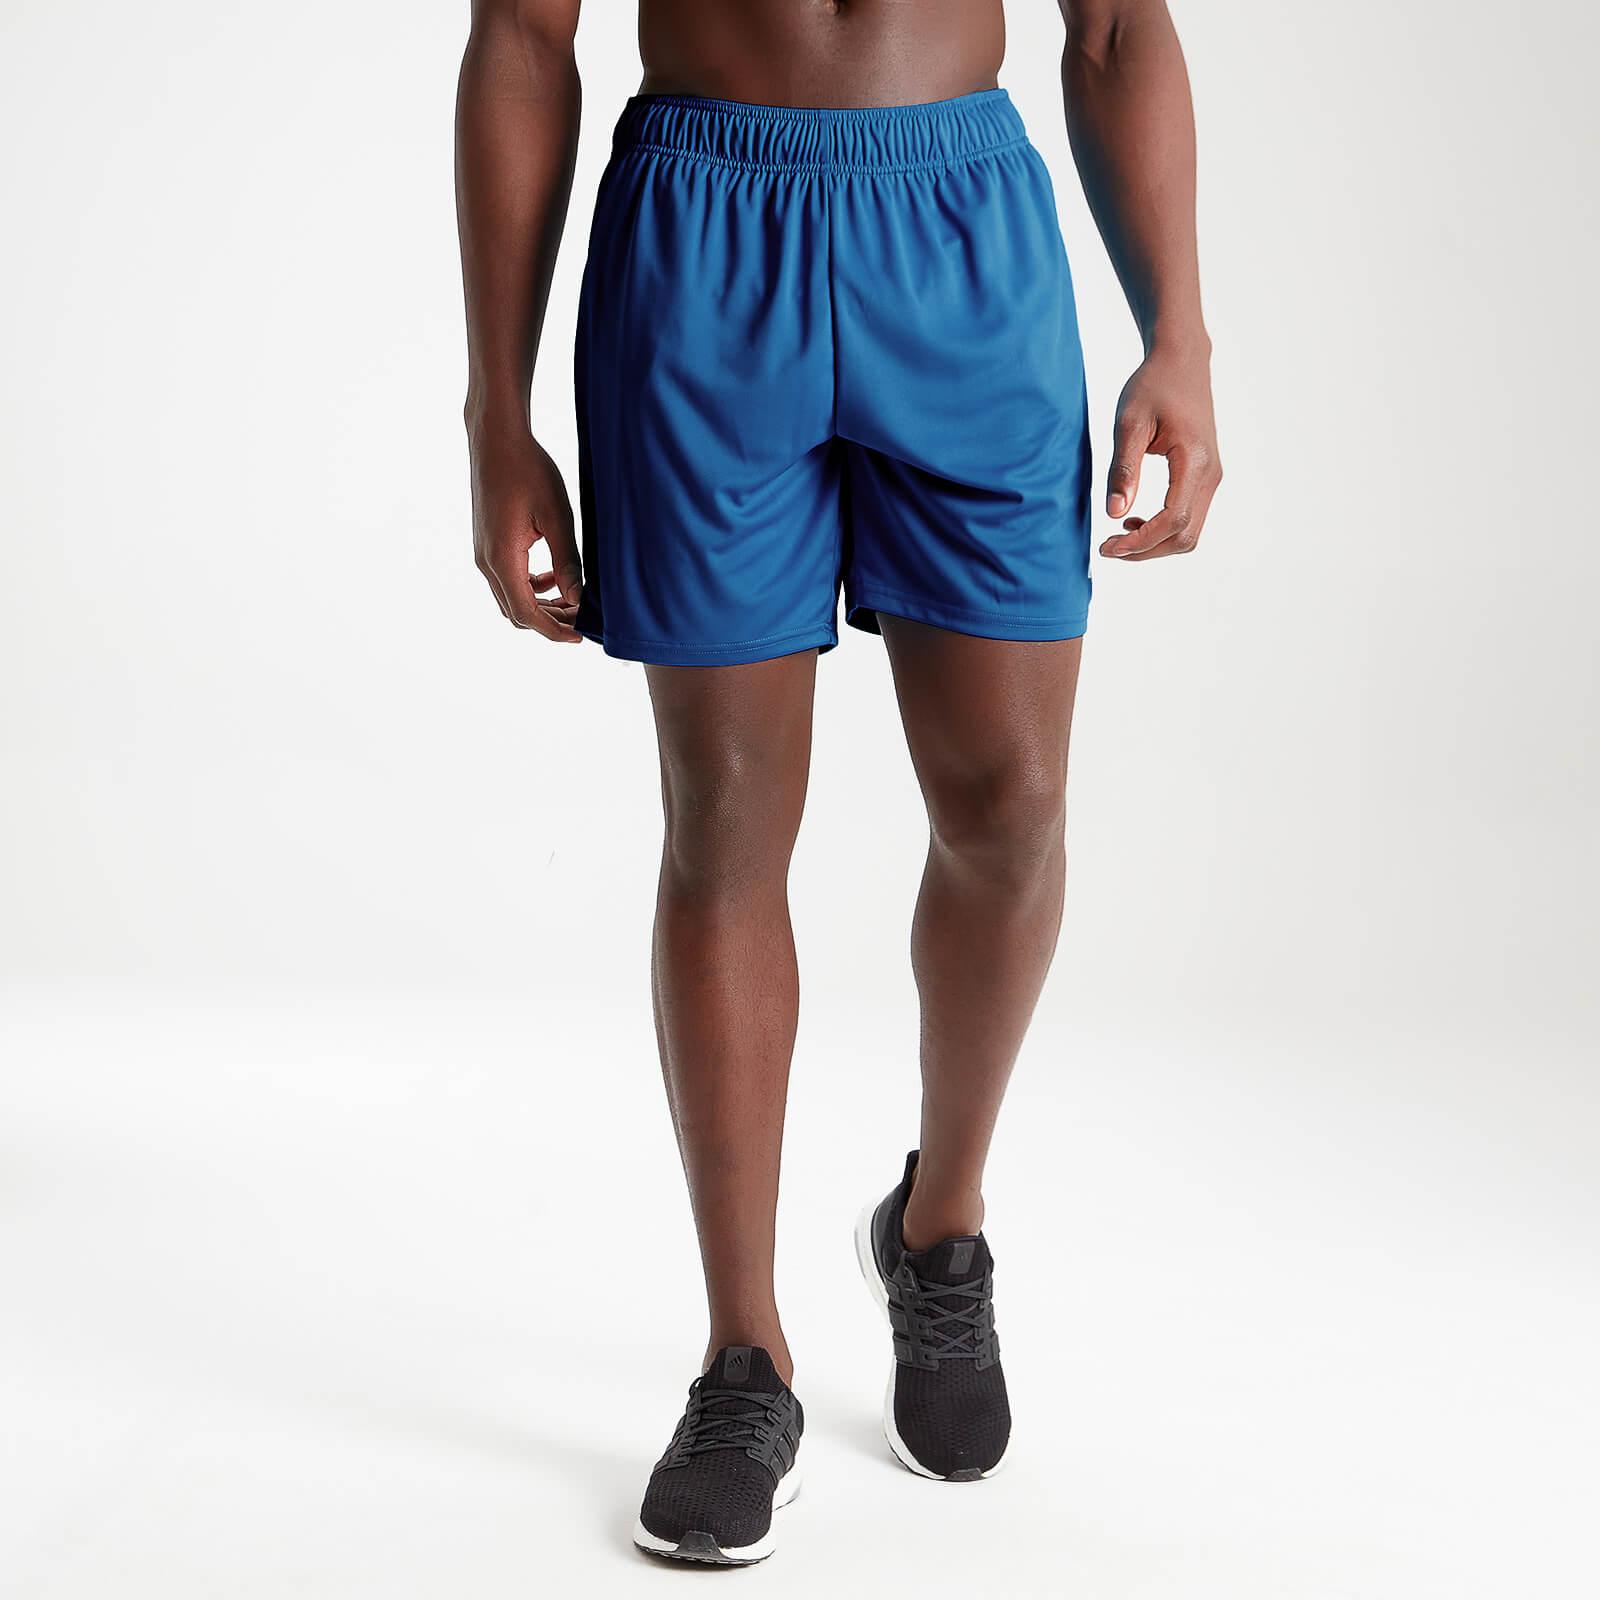 MP Men's Essentials Training Lightweight Shorts - Aqua - S